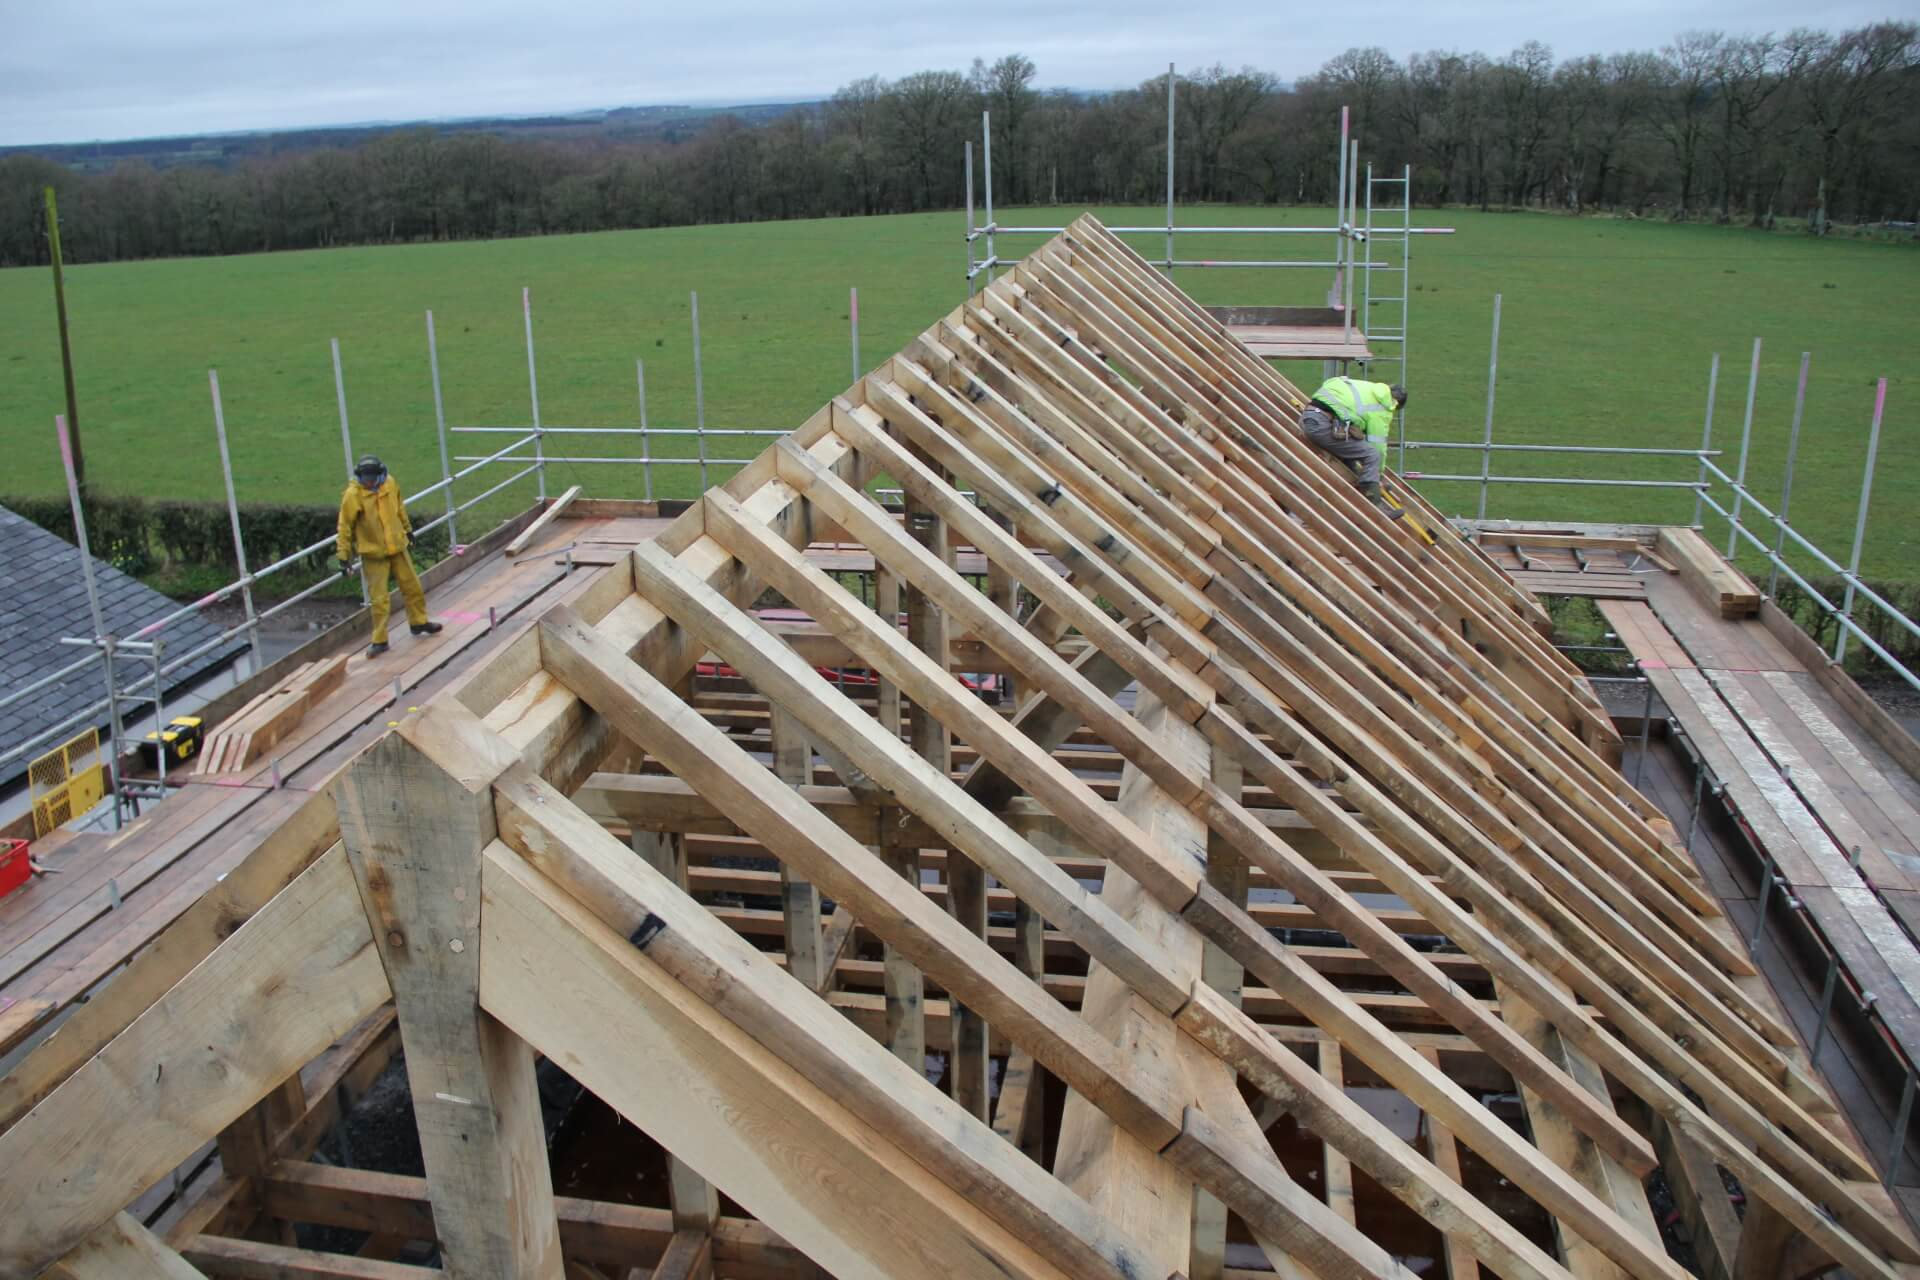 Rob Dawson timber framer